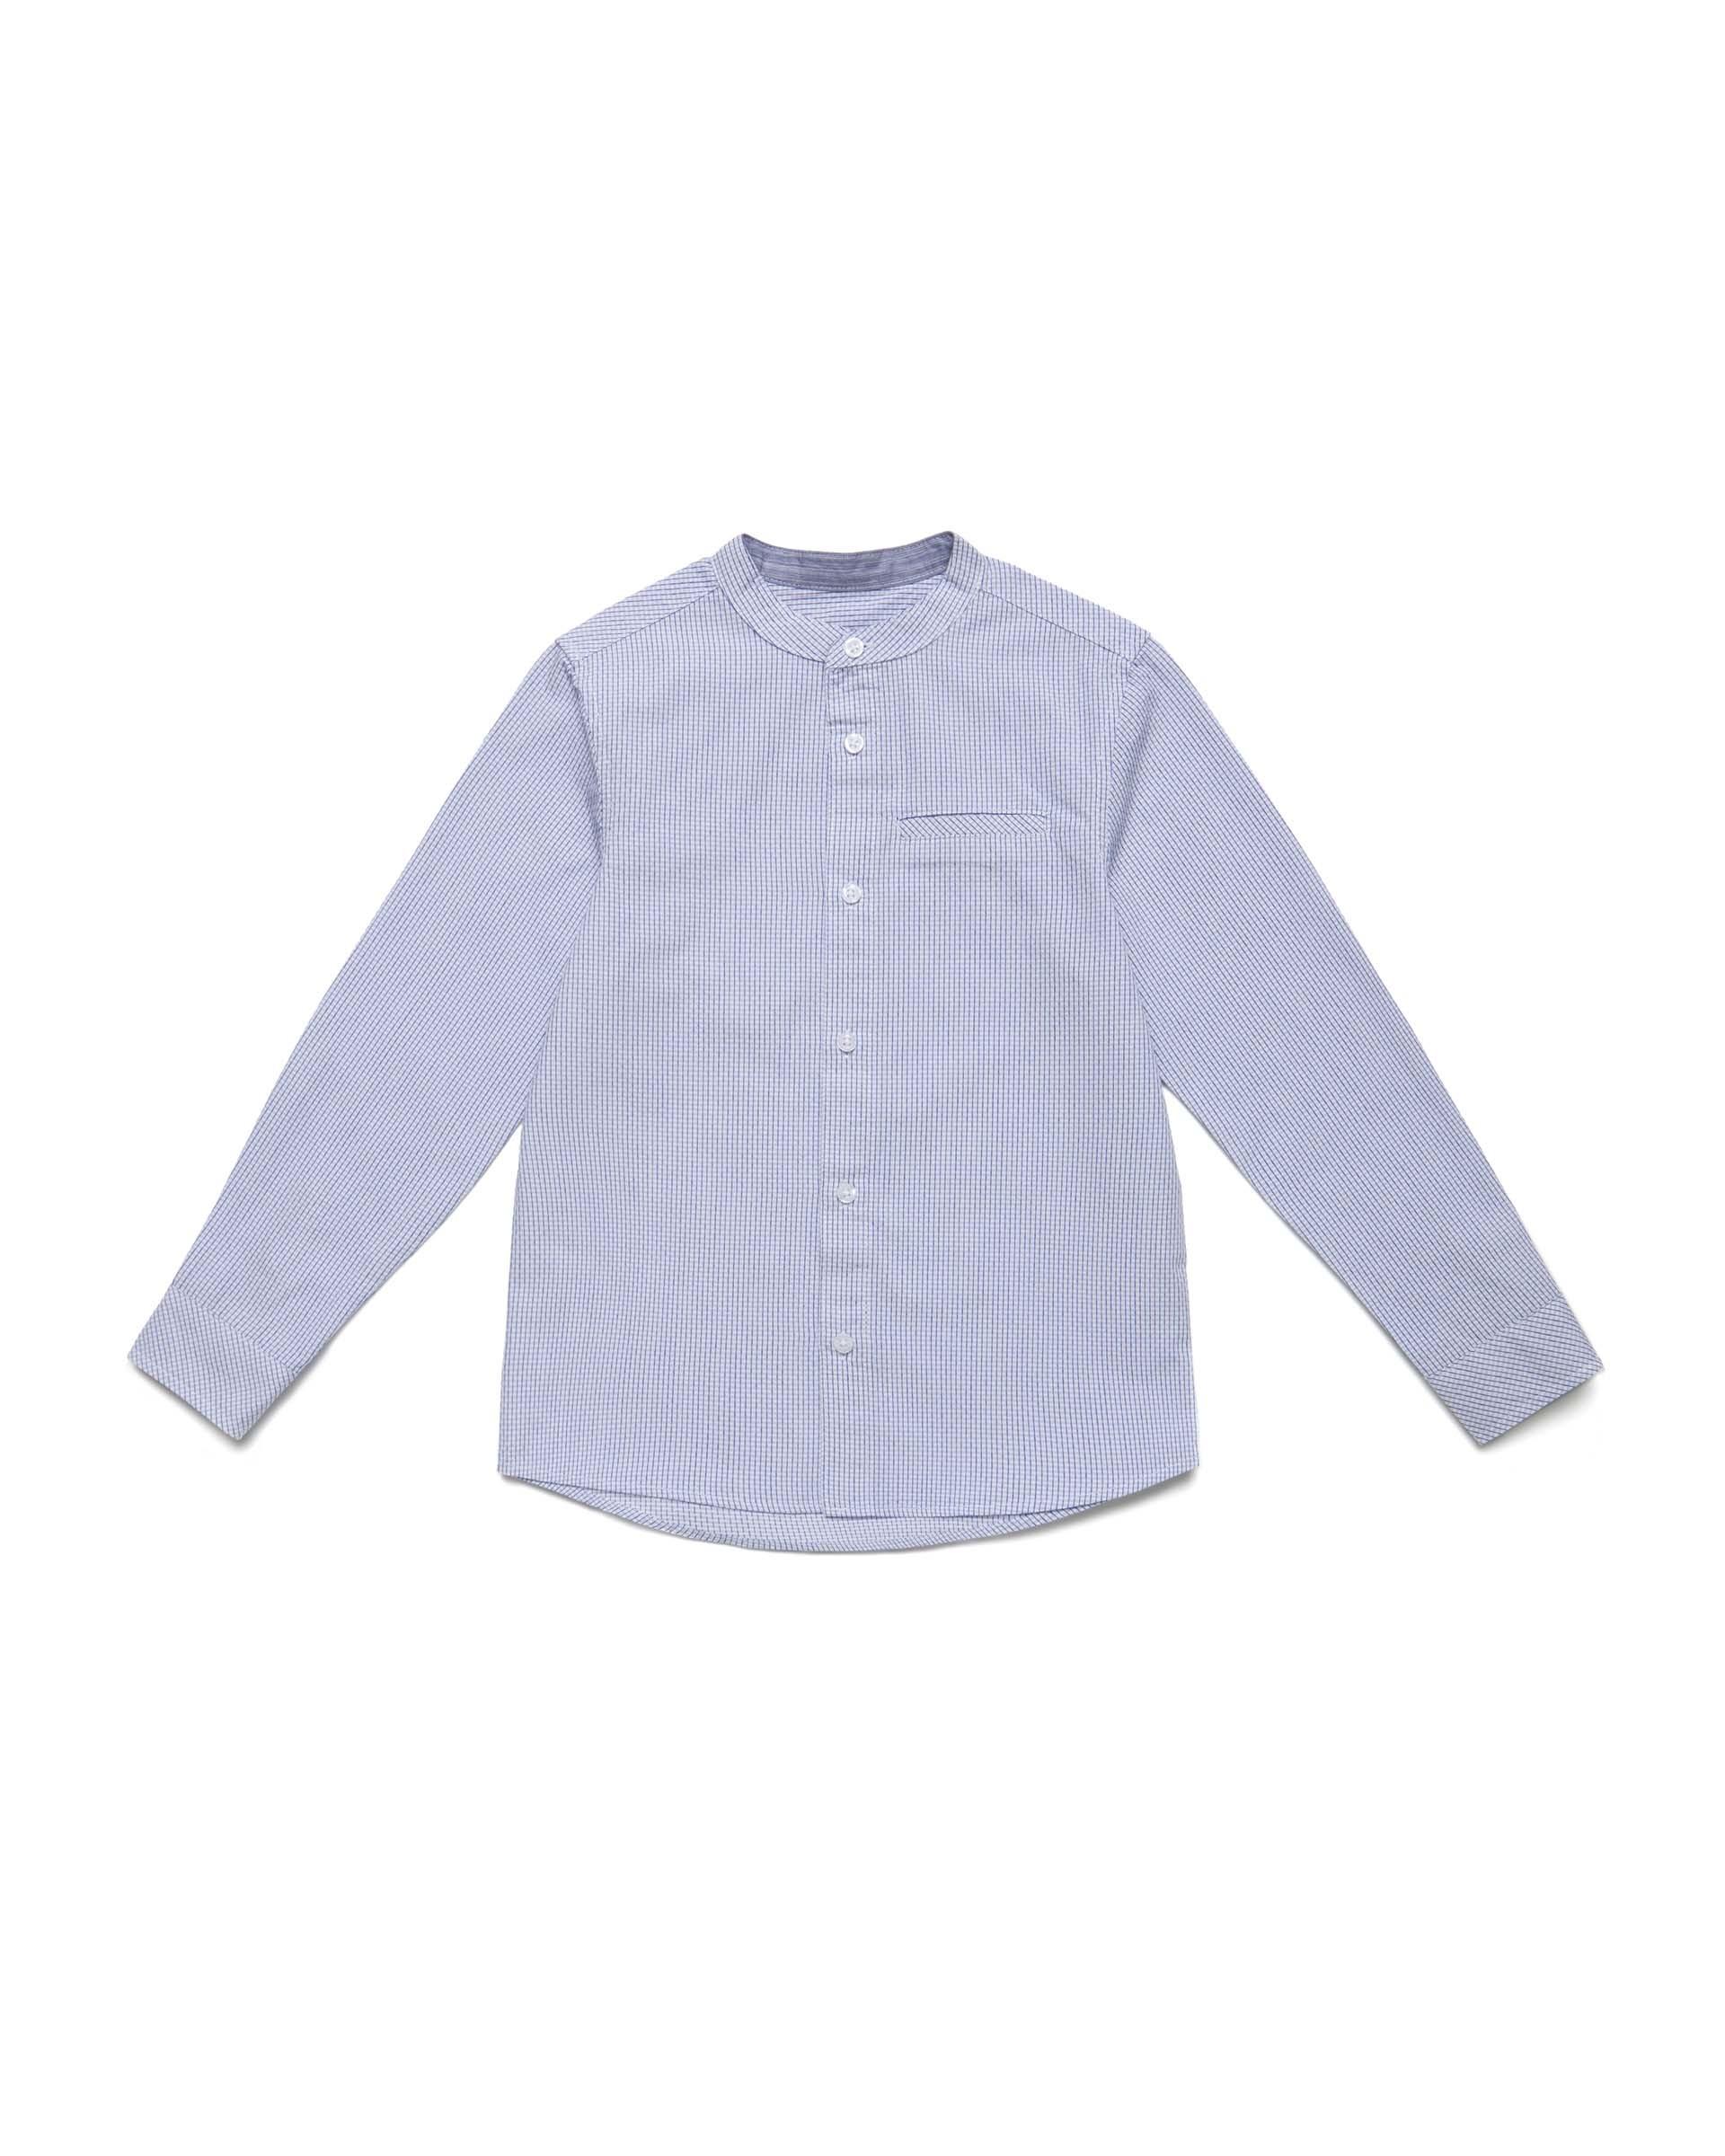 Купить 20P_5PC45QHA0_902, Рубашка для мальчиков Benetton 5PC45QHA0_902 р-р 122, United Colors of Benetton, Рубашки для мальчиков